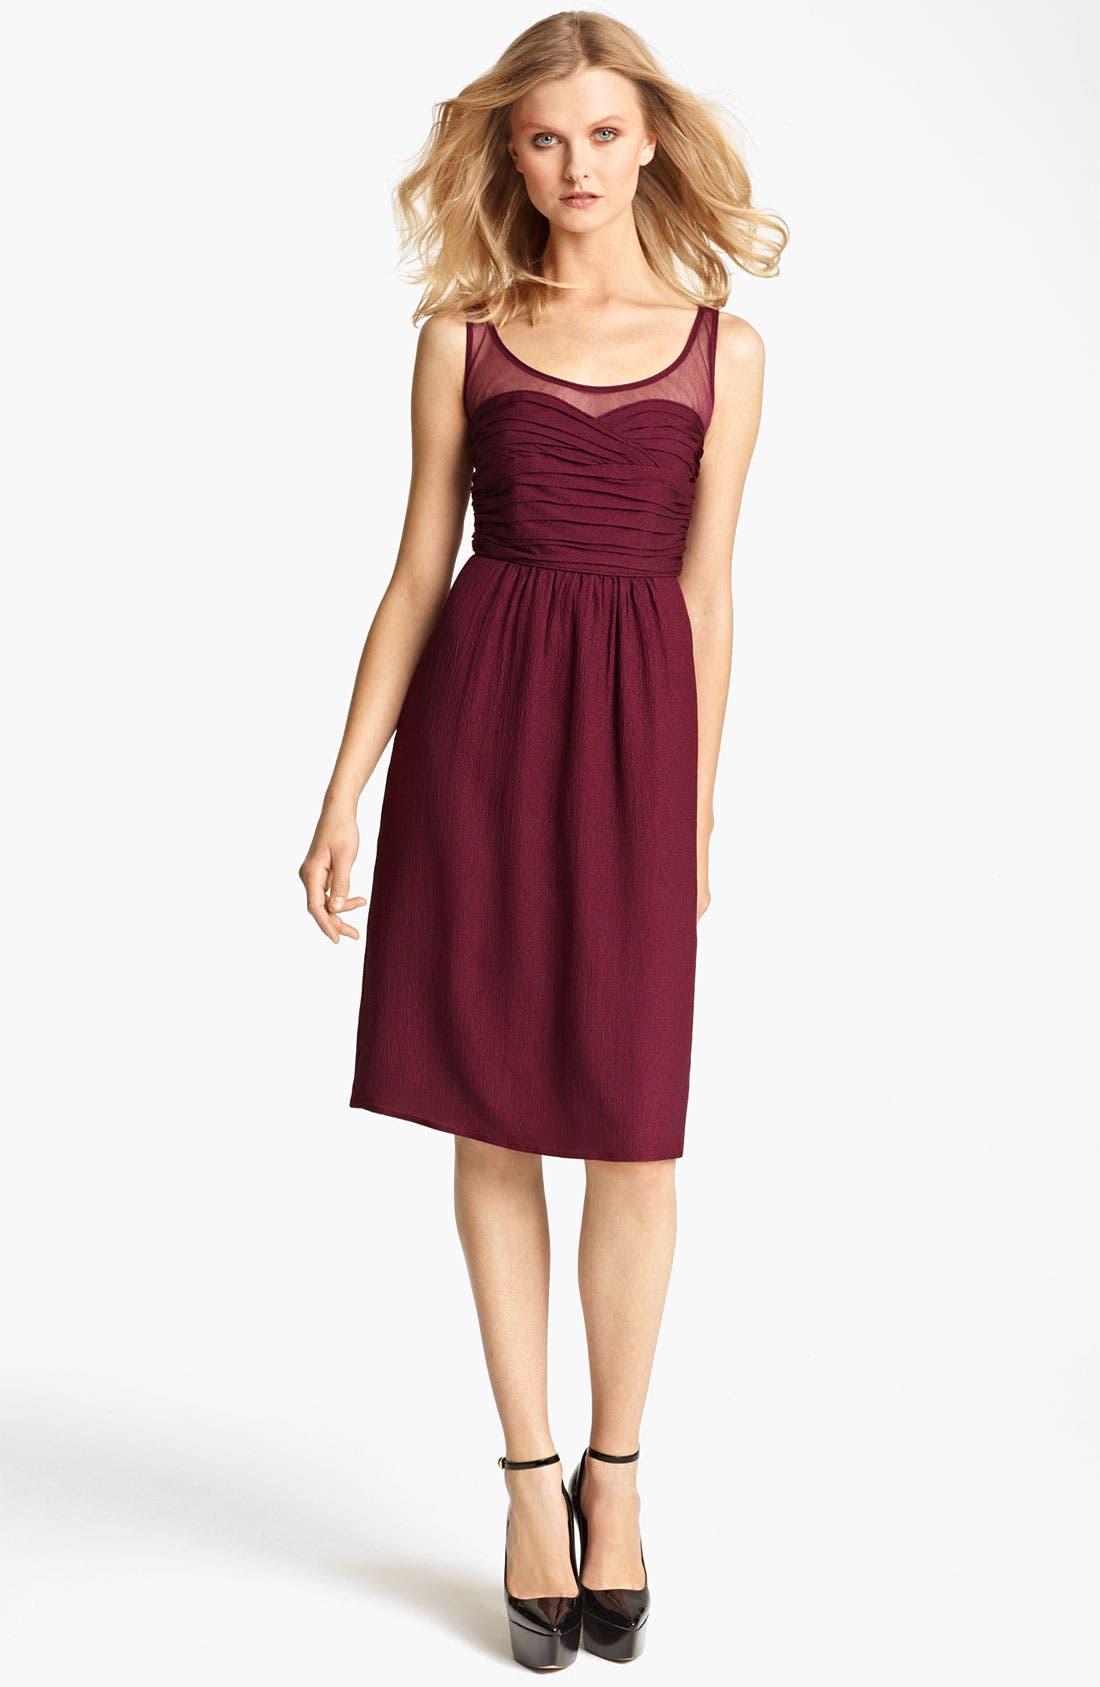 Alternate Image 1 Selected - Burberry London Sleeveless Crinkle Chiffon Dress